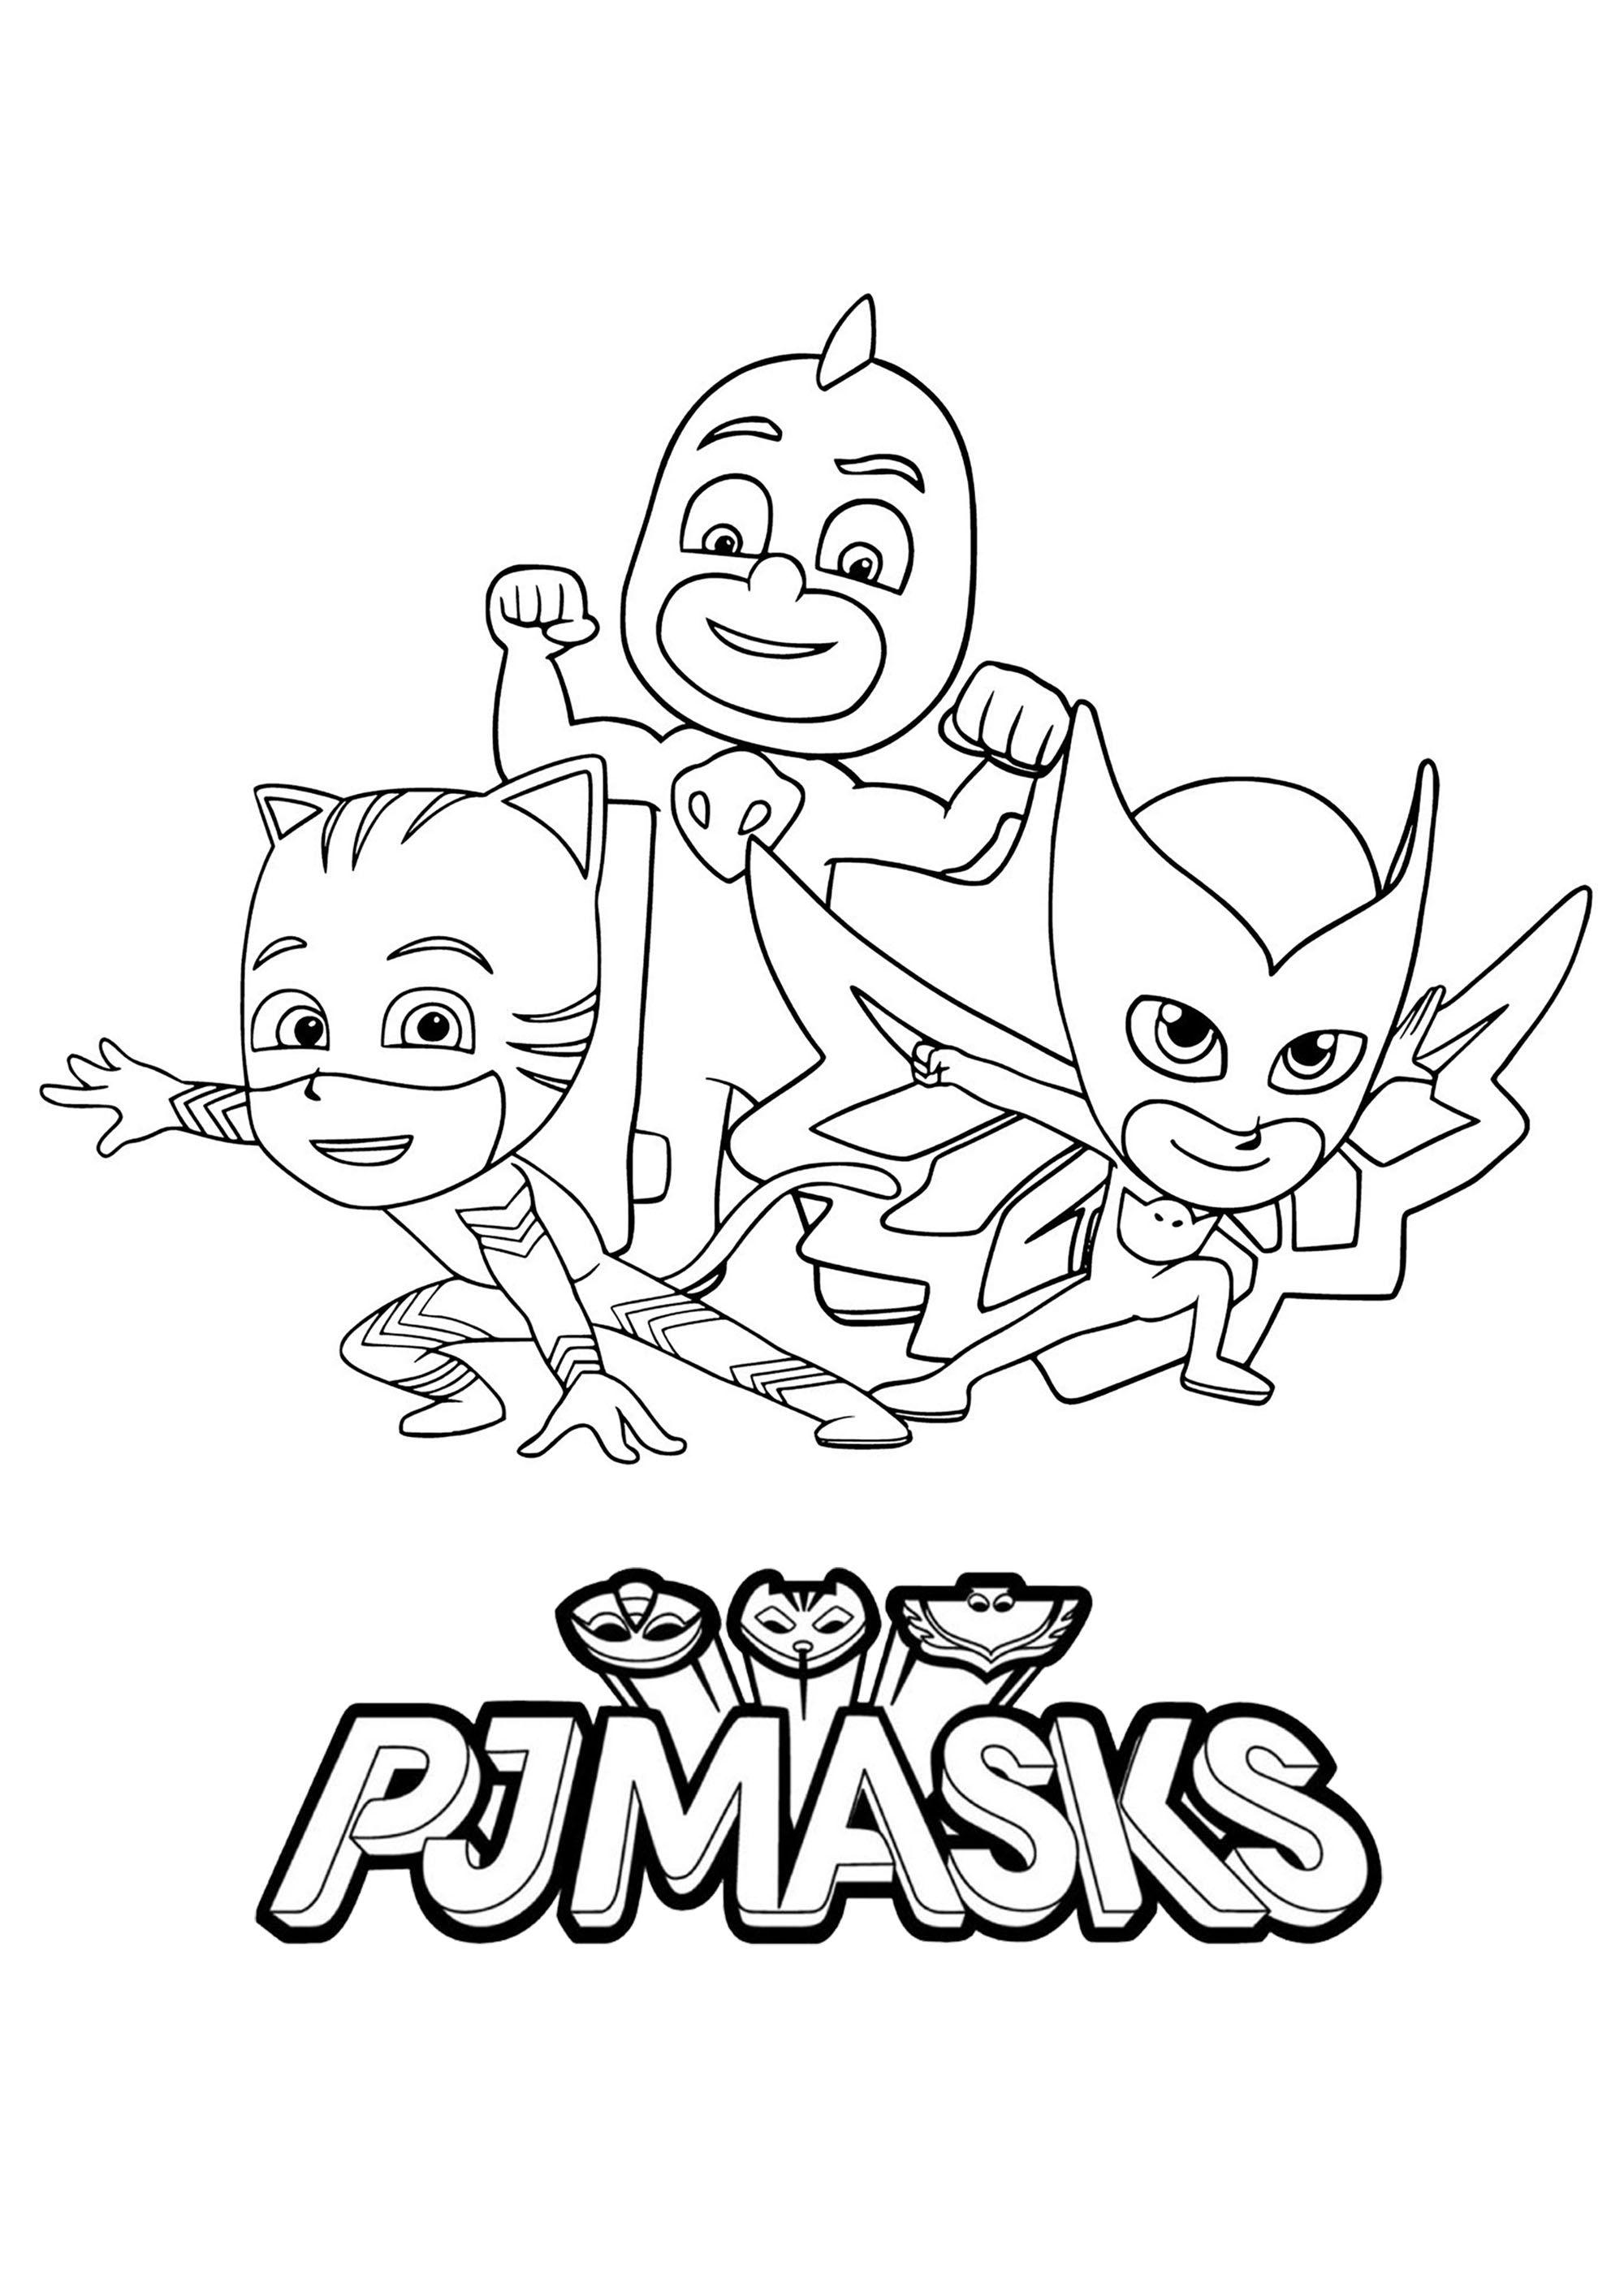 Pj Masks Coloring Page With Few Details For Kids | Jack's